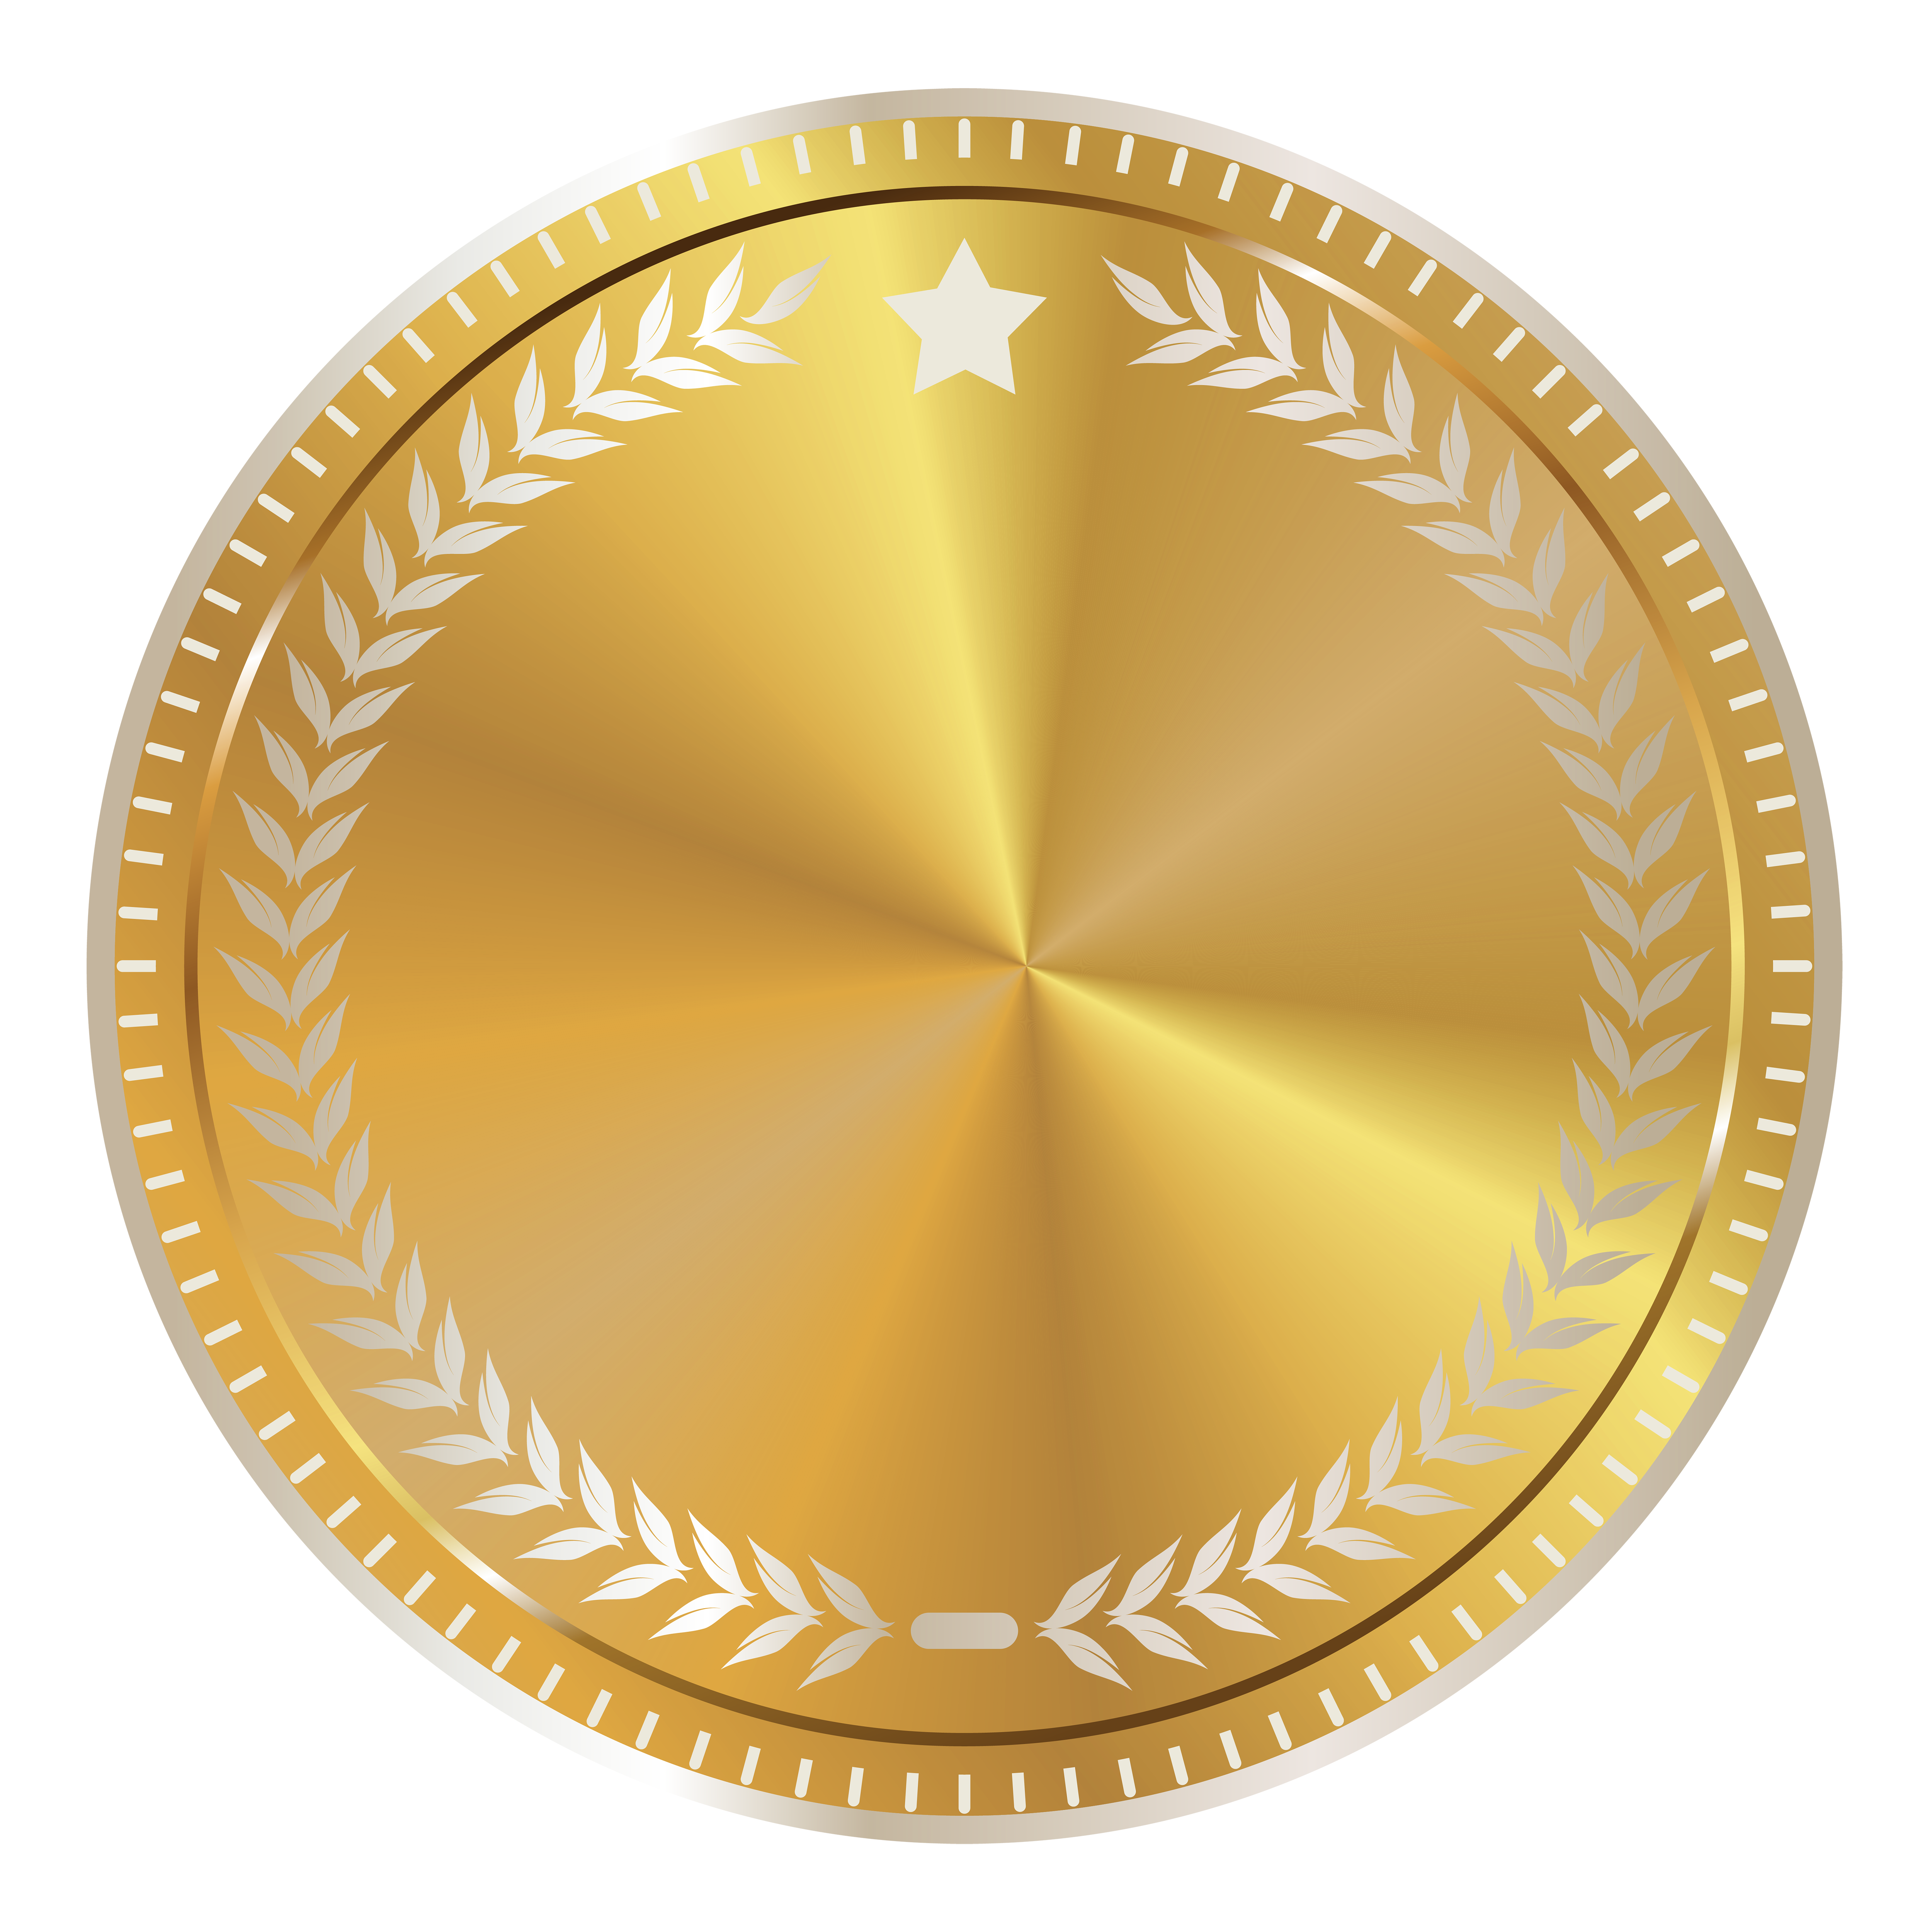 Gold Seal Badge With Decoration Png Clipart Image Bingkai Kartu Nama Kartu